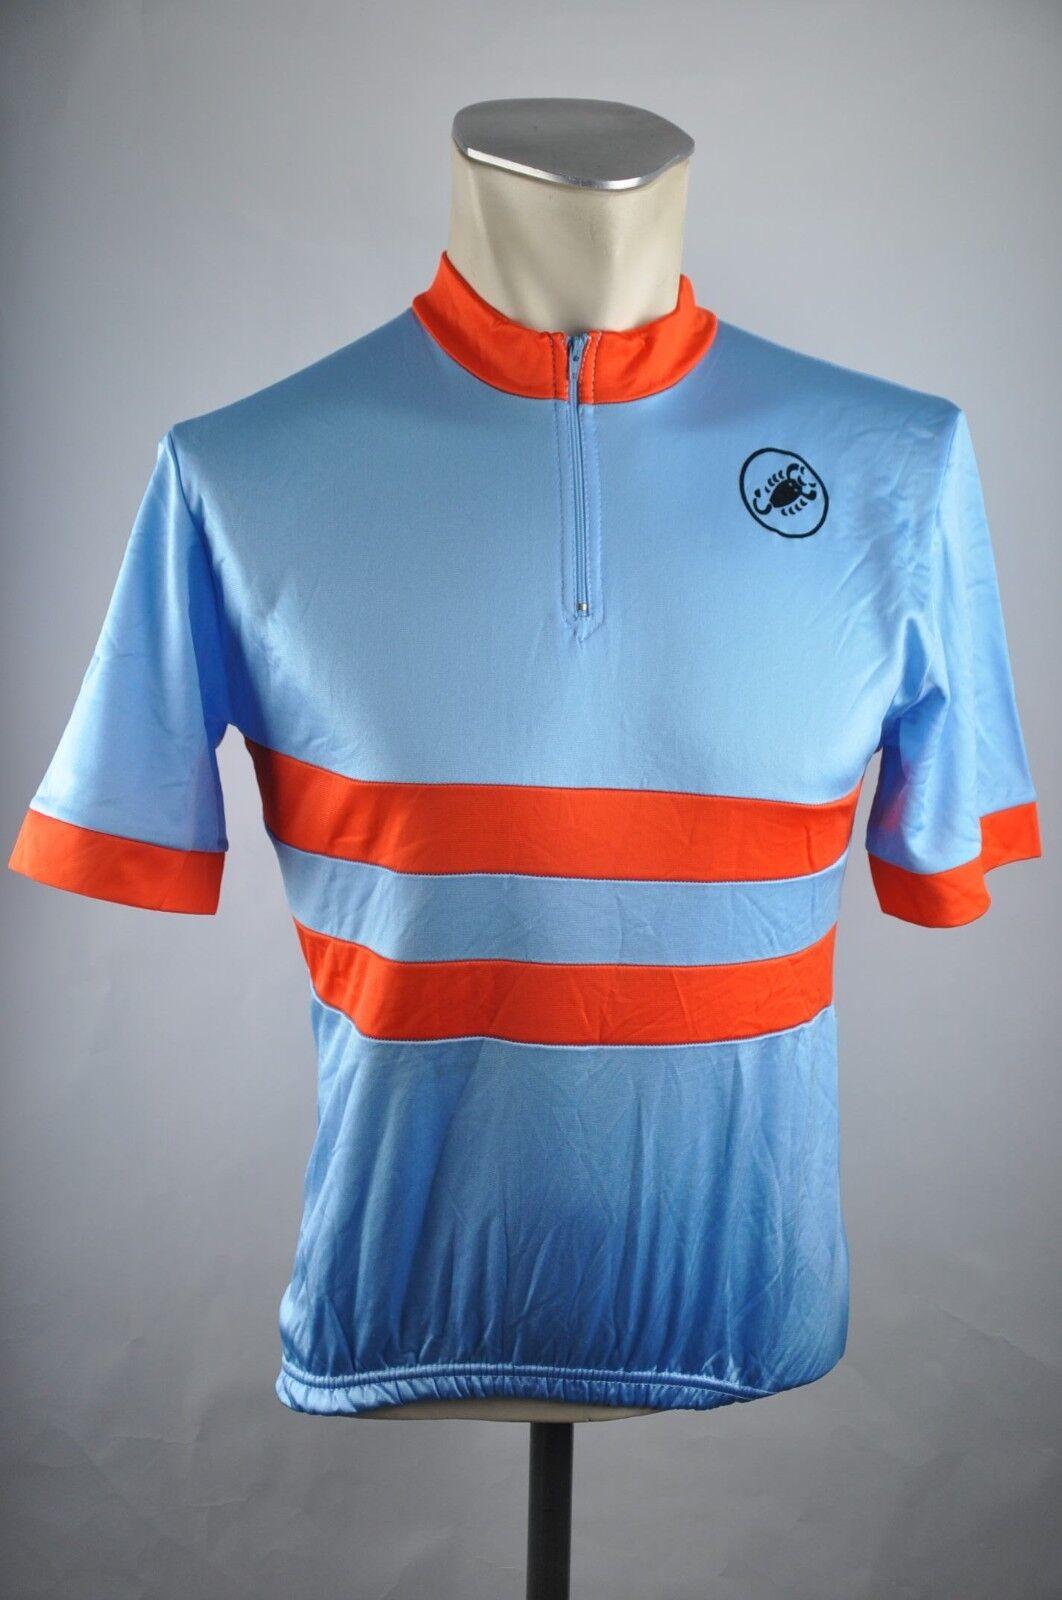 Castelli Rad Trikot Trikot Trikot Fahrrad Gr. S 47cm vintage 90er Bike cycling jersey Shirt P5 | Ruf zuerst  7bbf19